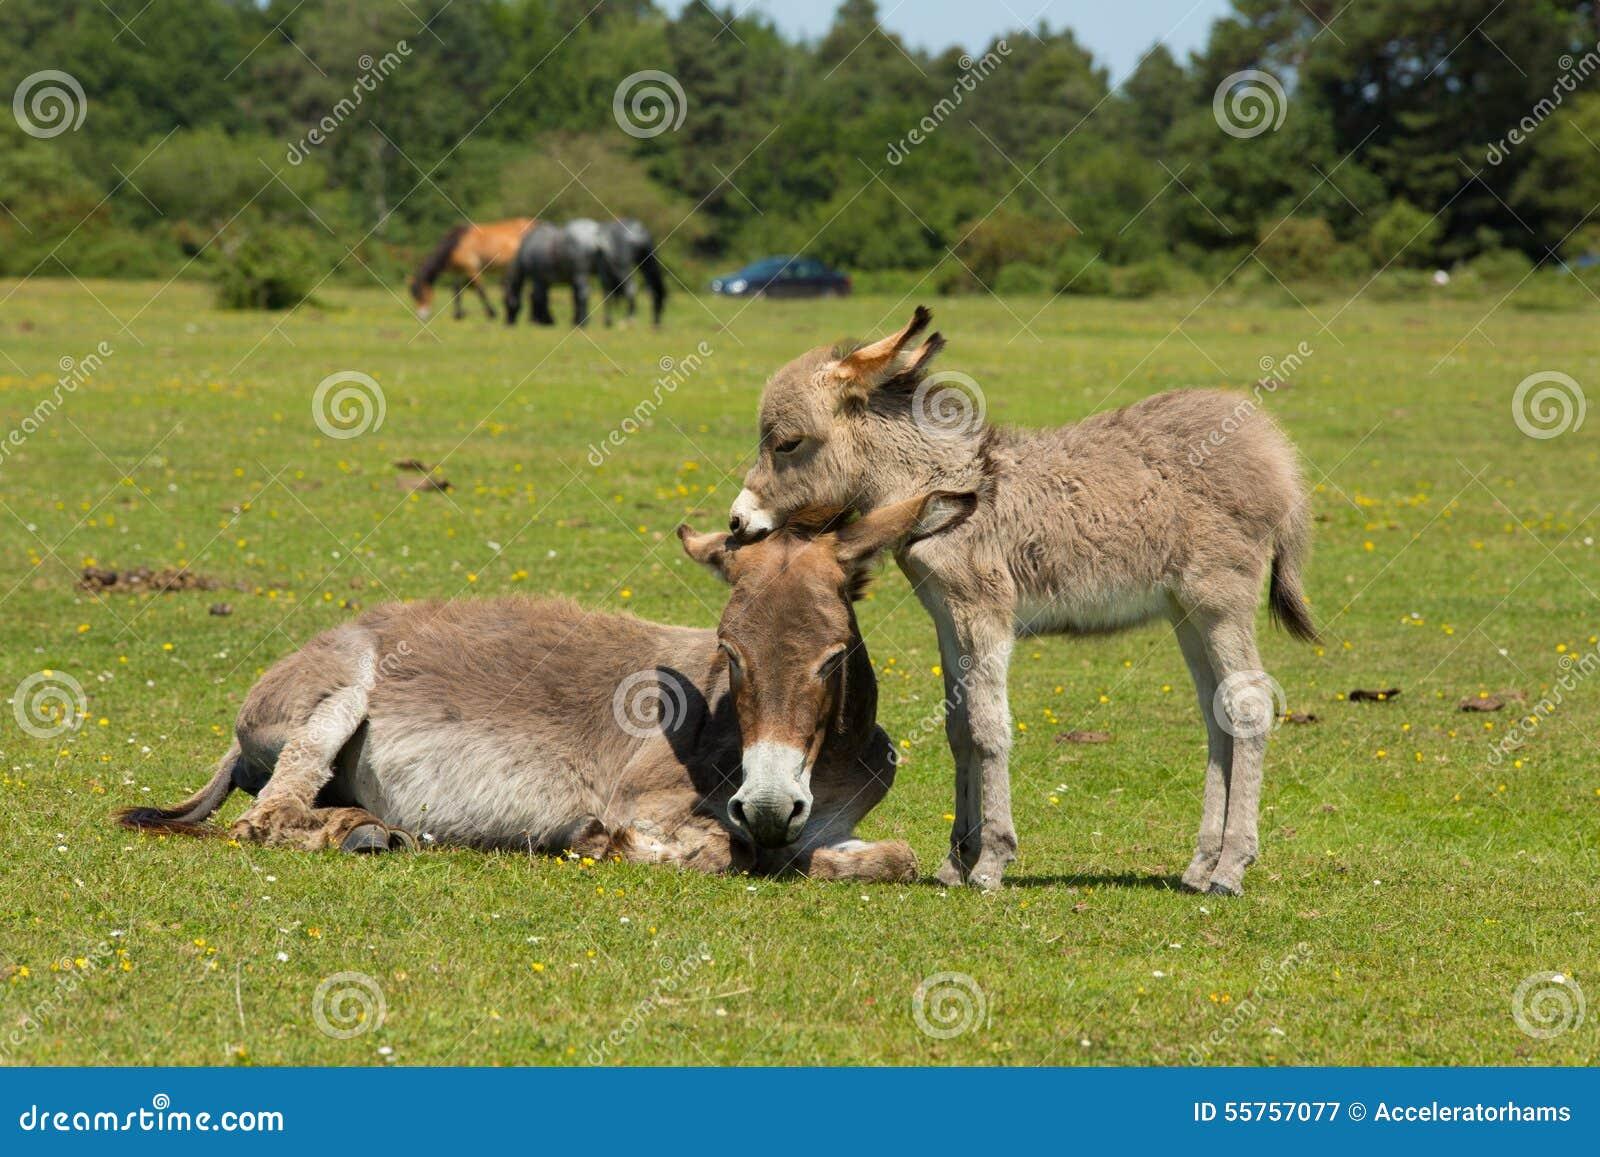 mom make love with donkey